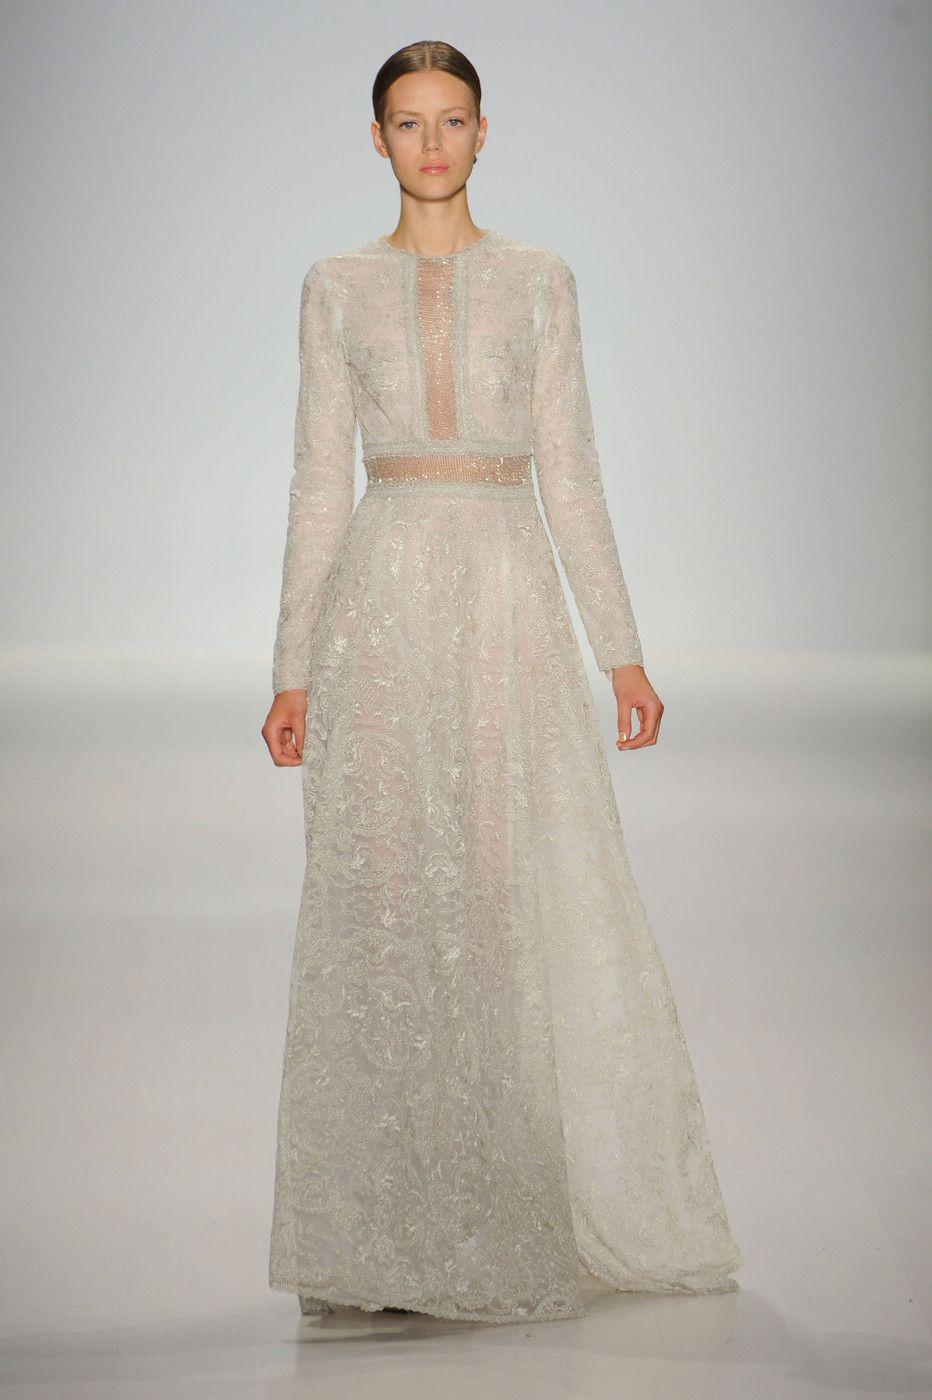 Tadashi shoji spring runway pictures beautiful wedding and